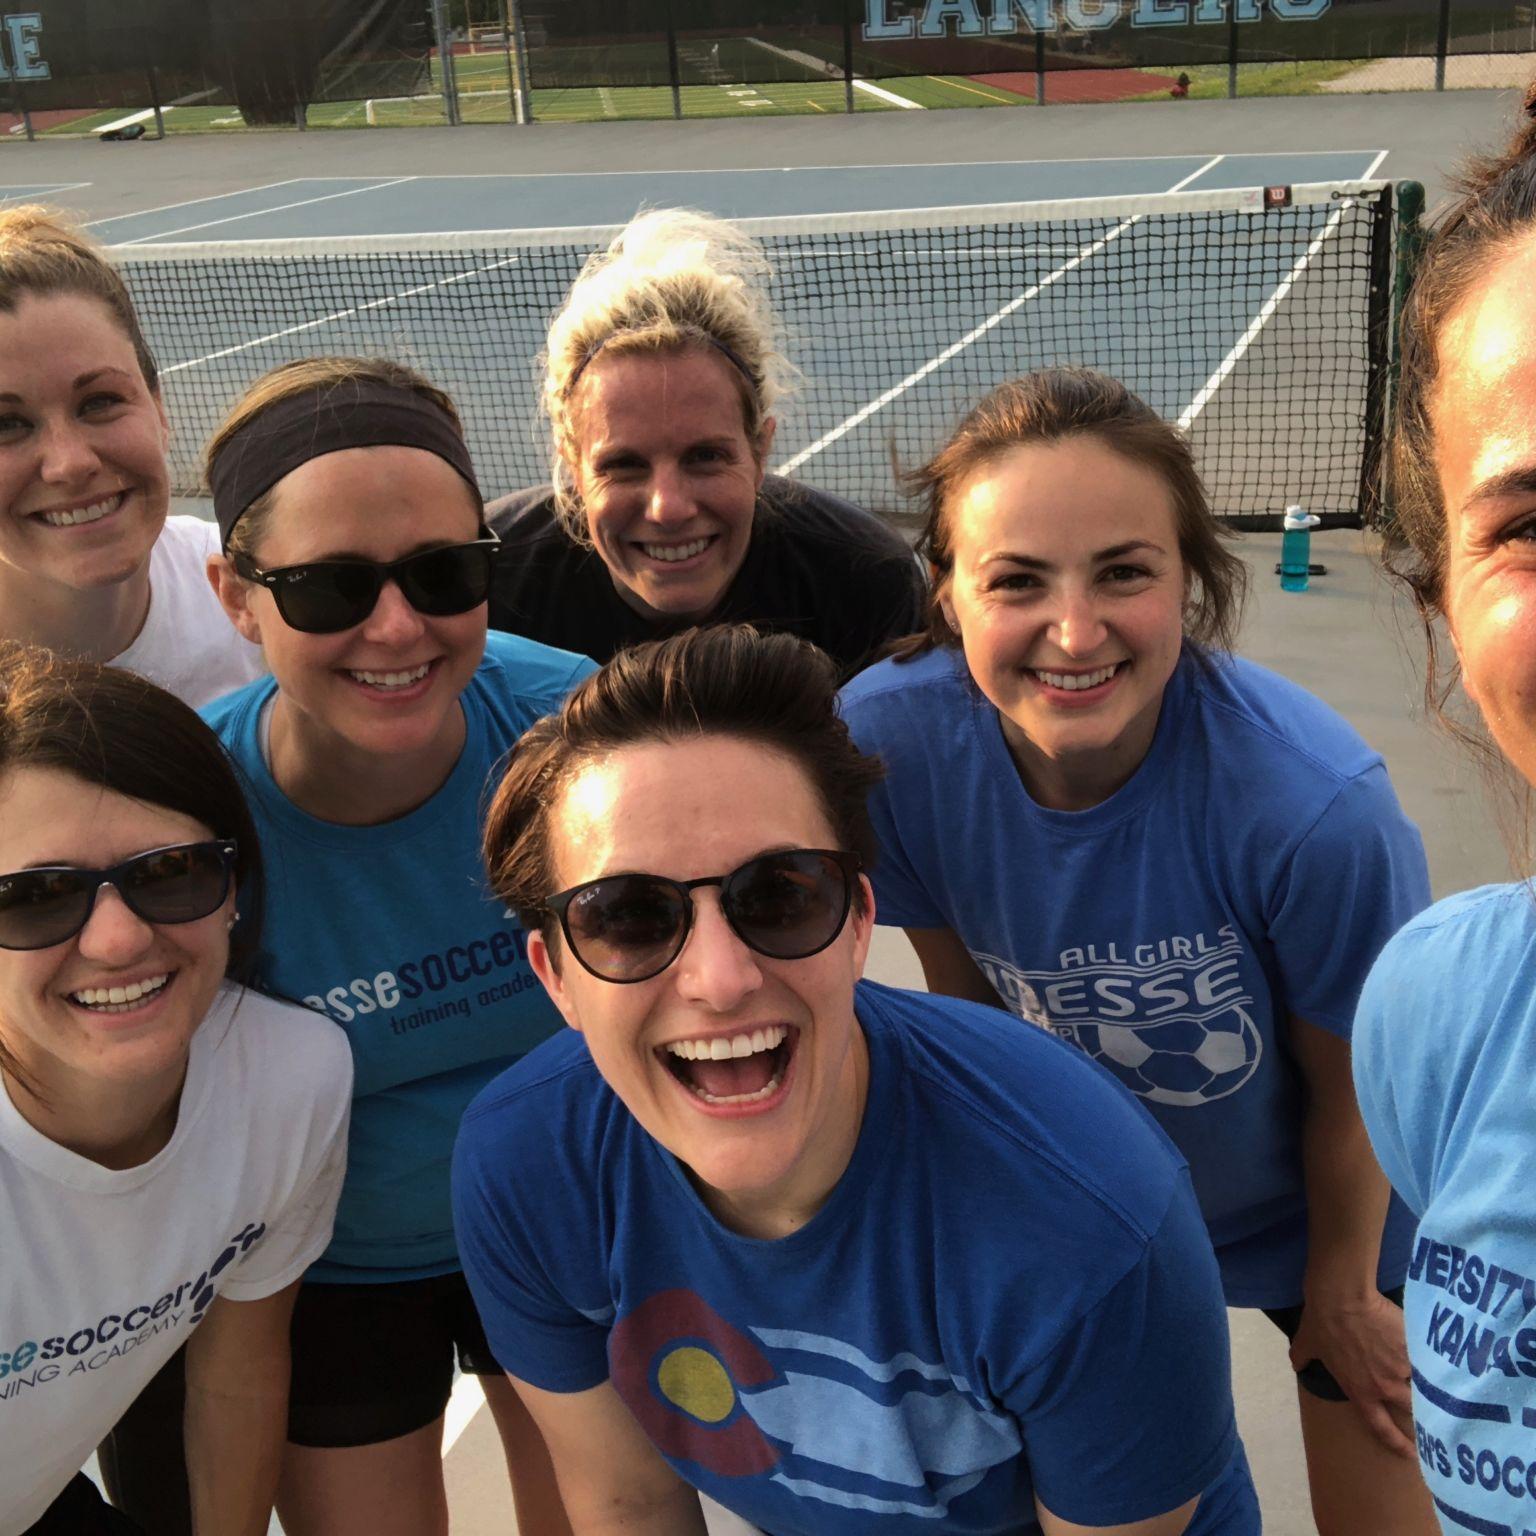 team soccer tennis